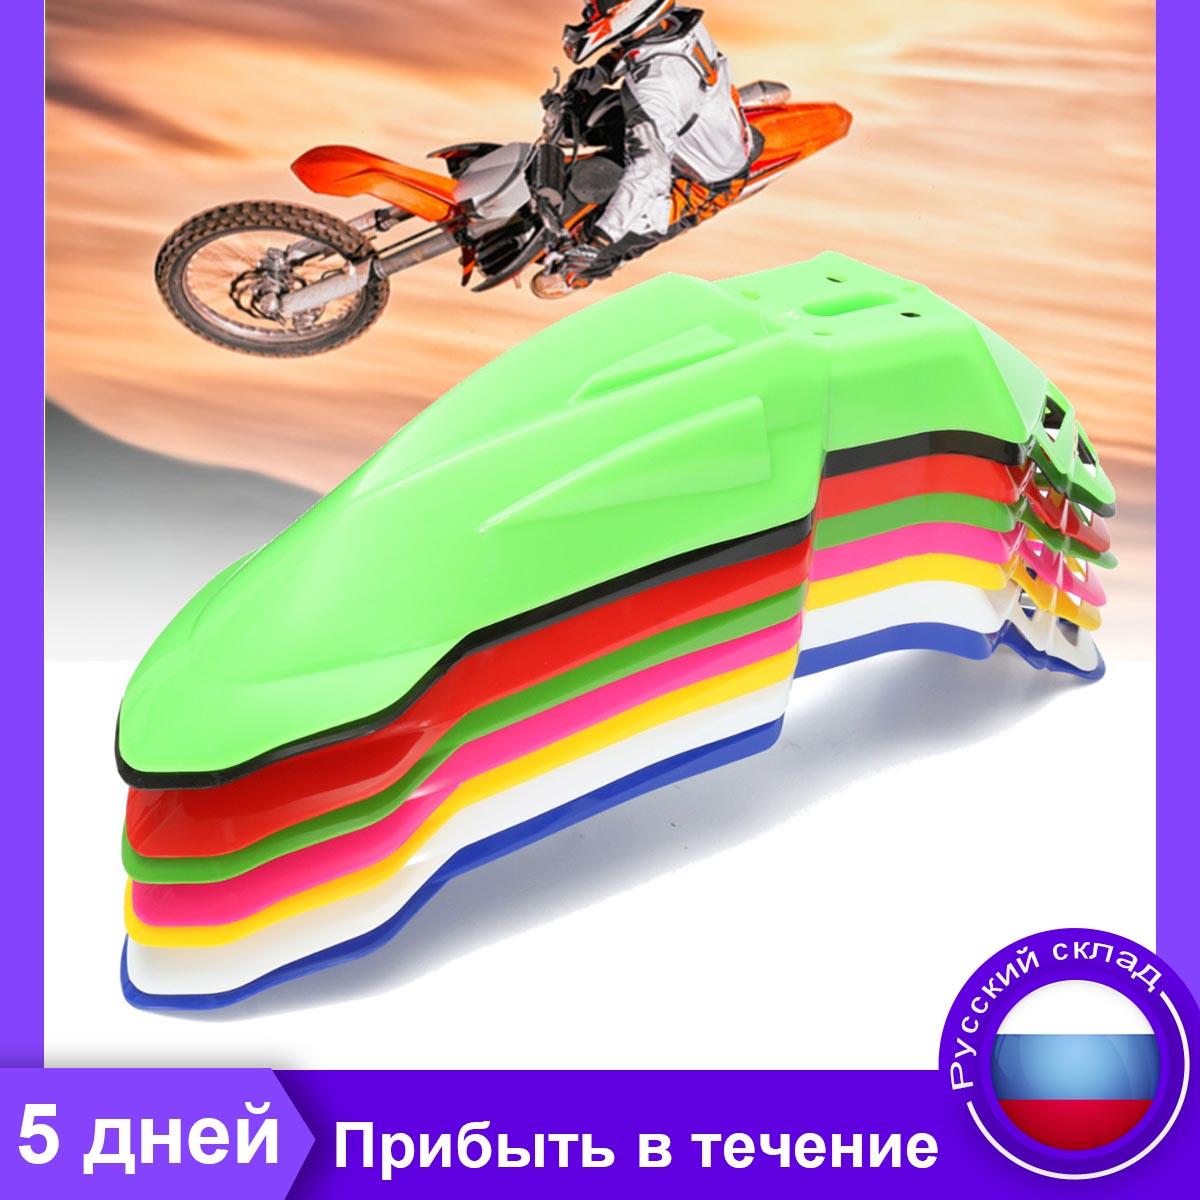 Motorcycle Universal Fender Extender Front Rear Mudguard For Yamaha Kawasaki KTM